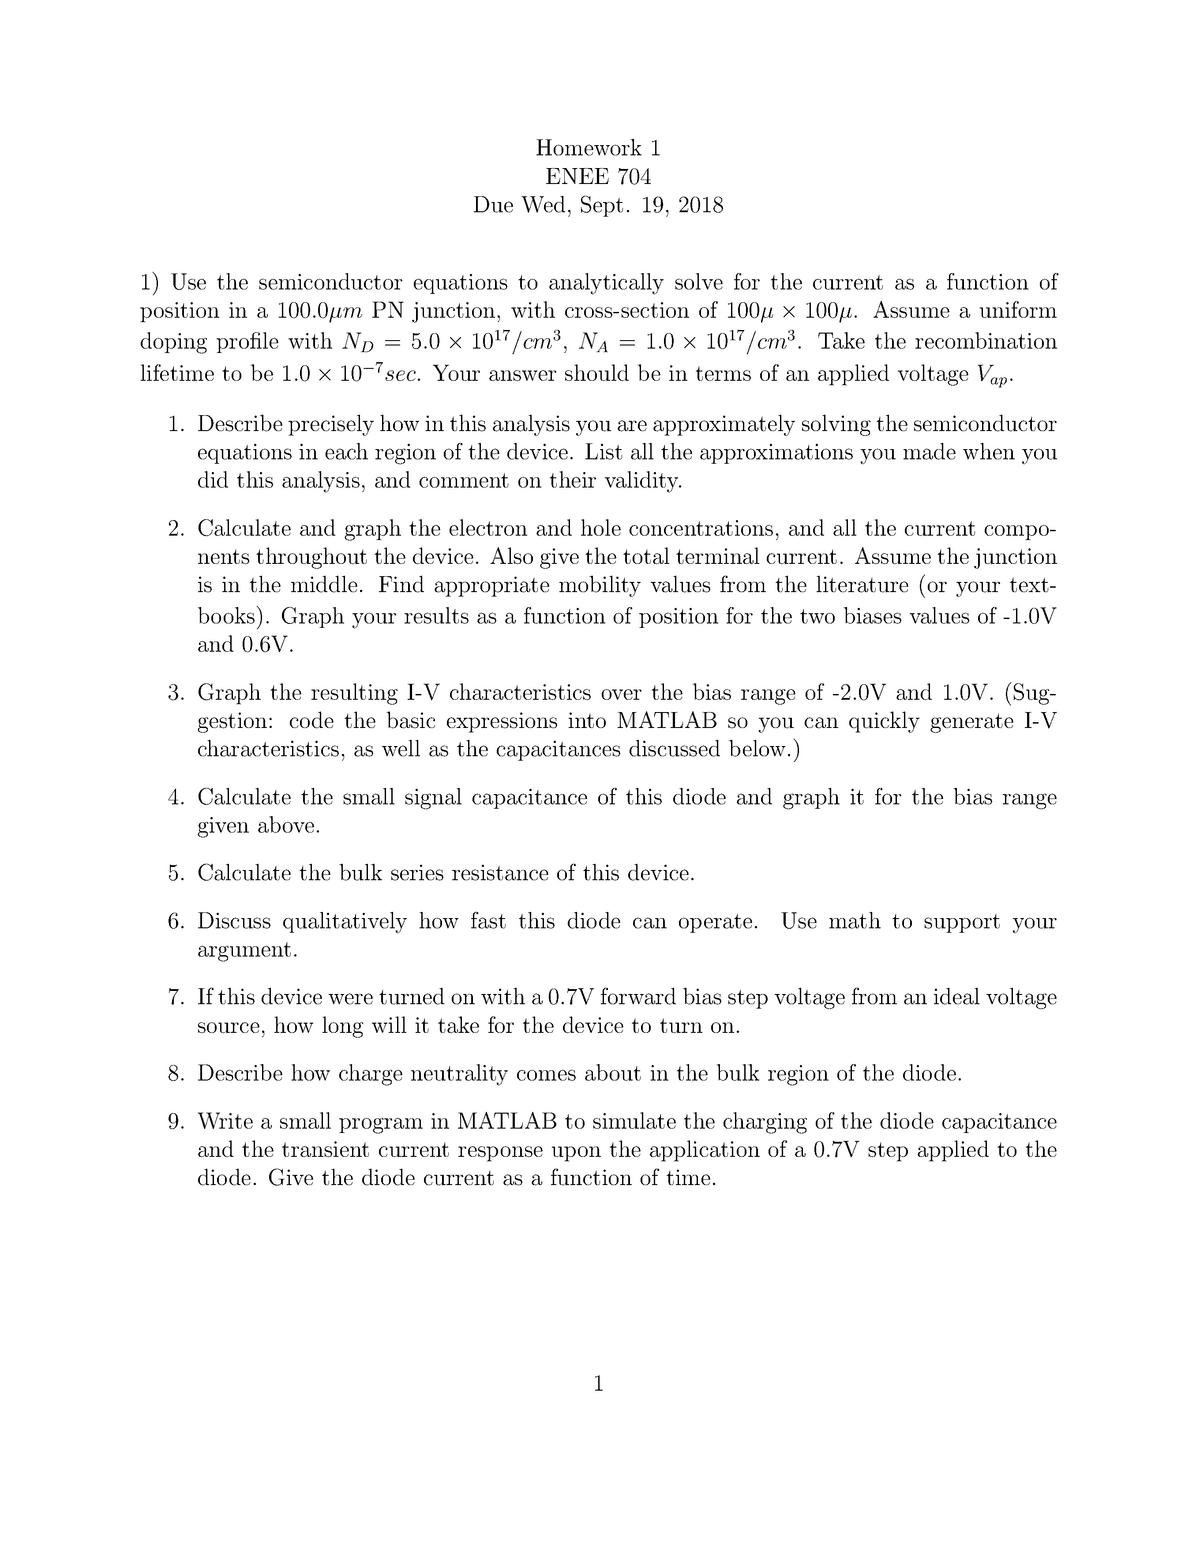 HW#1 - Homework 1 - ENEE704: Physics and Simulation of